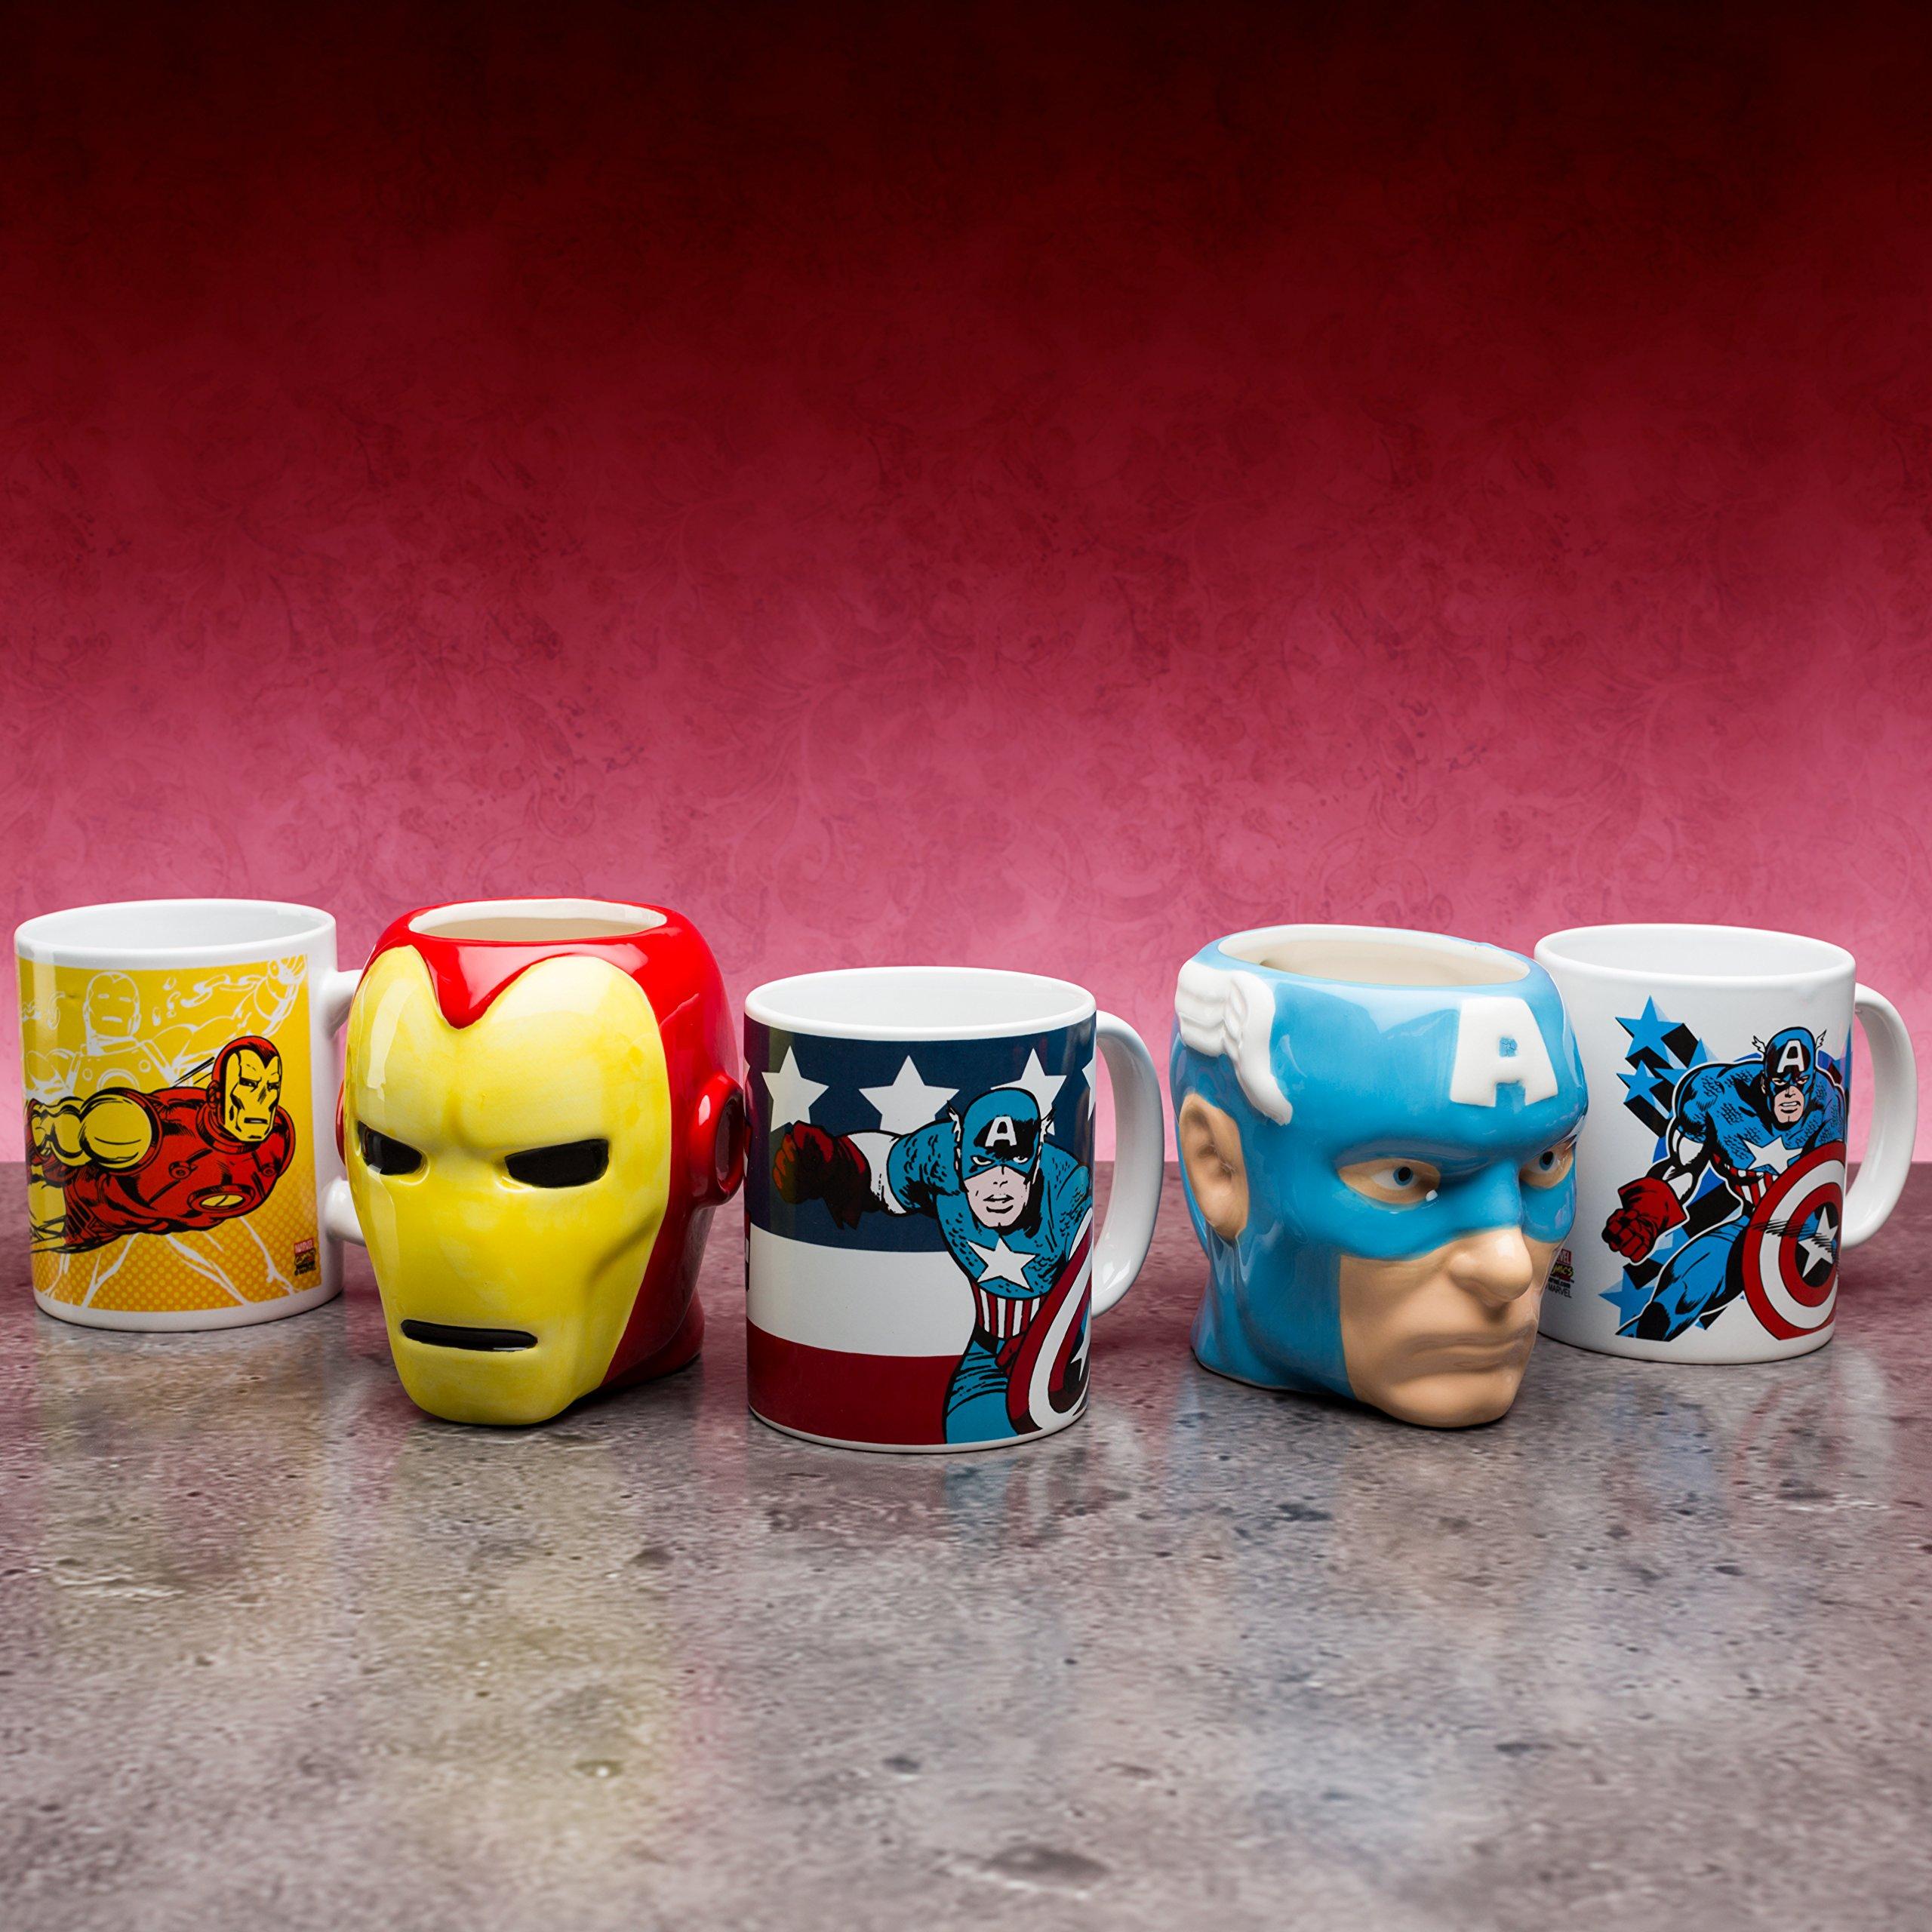 Zak Designs MRTI-8513 Marvel Comics Sculpted Ceramic Coffee Cup, Captain America by Zak Designs (Image #3)